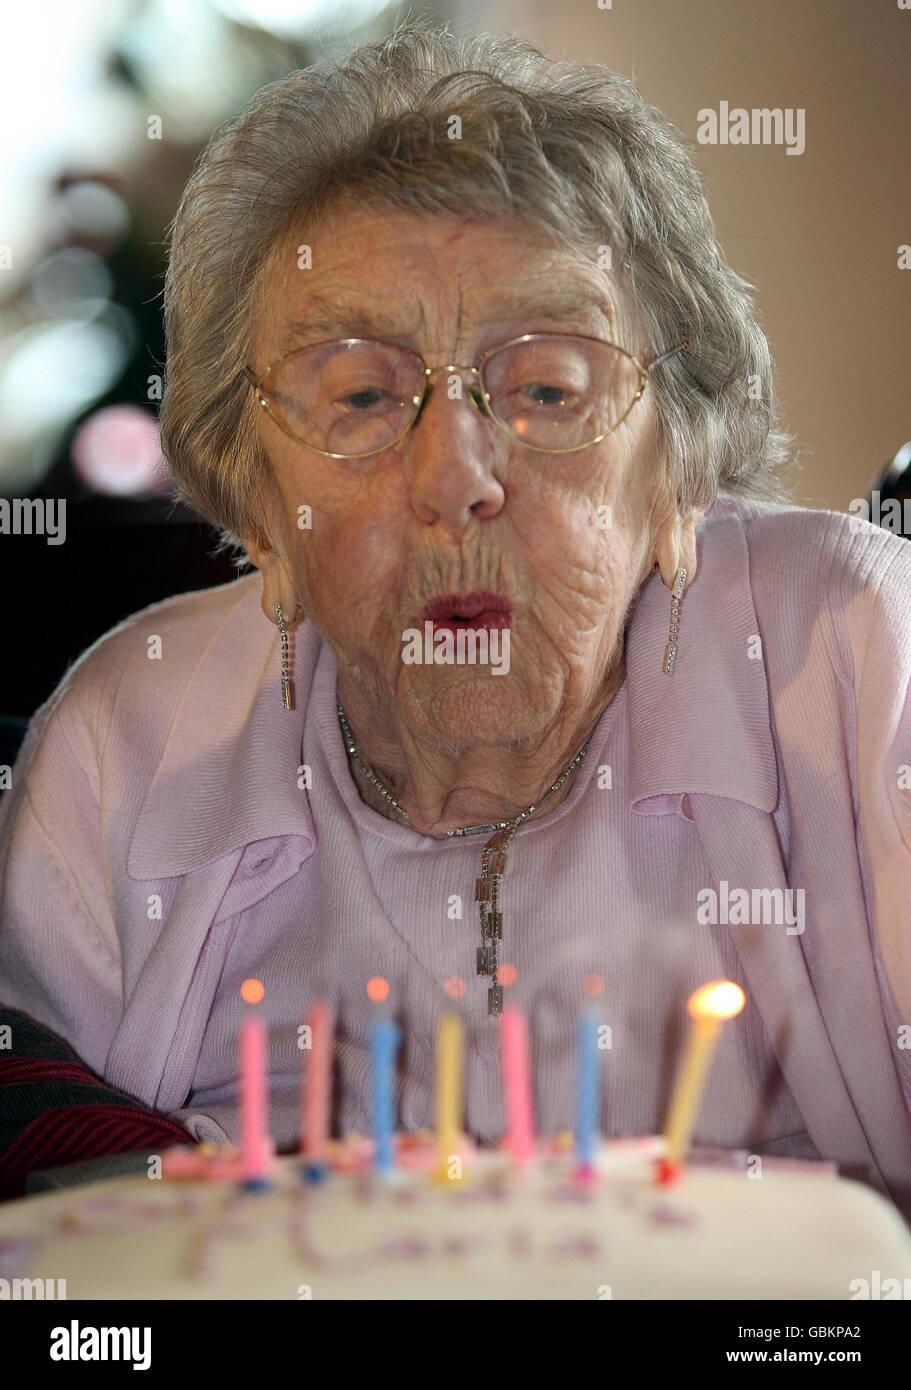 107 Jahre Alte Frau Feiert Geburtstag Stockfoto Bild 110458042 Alamy